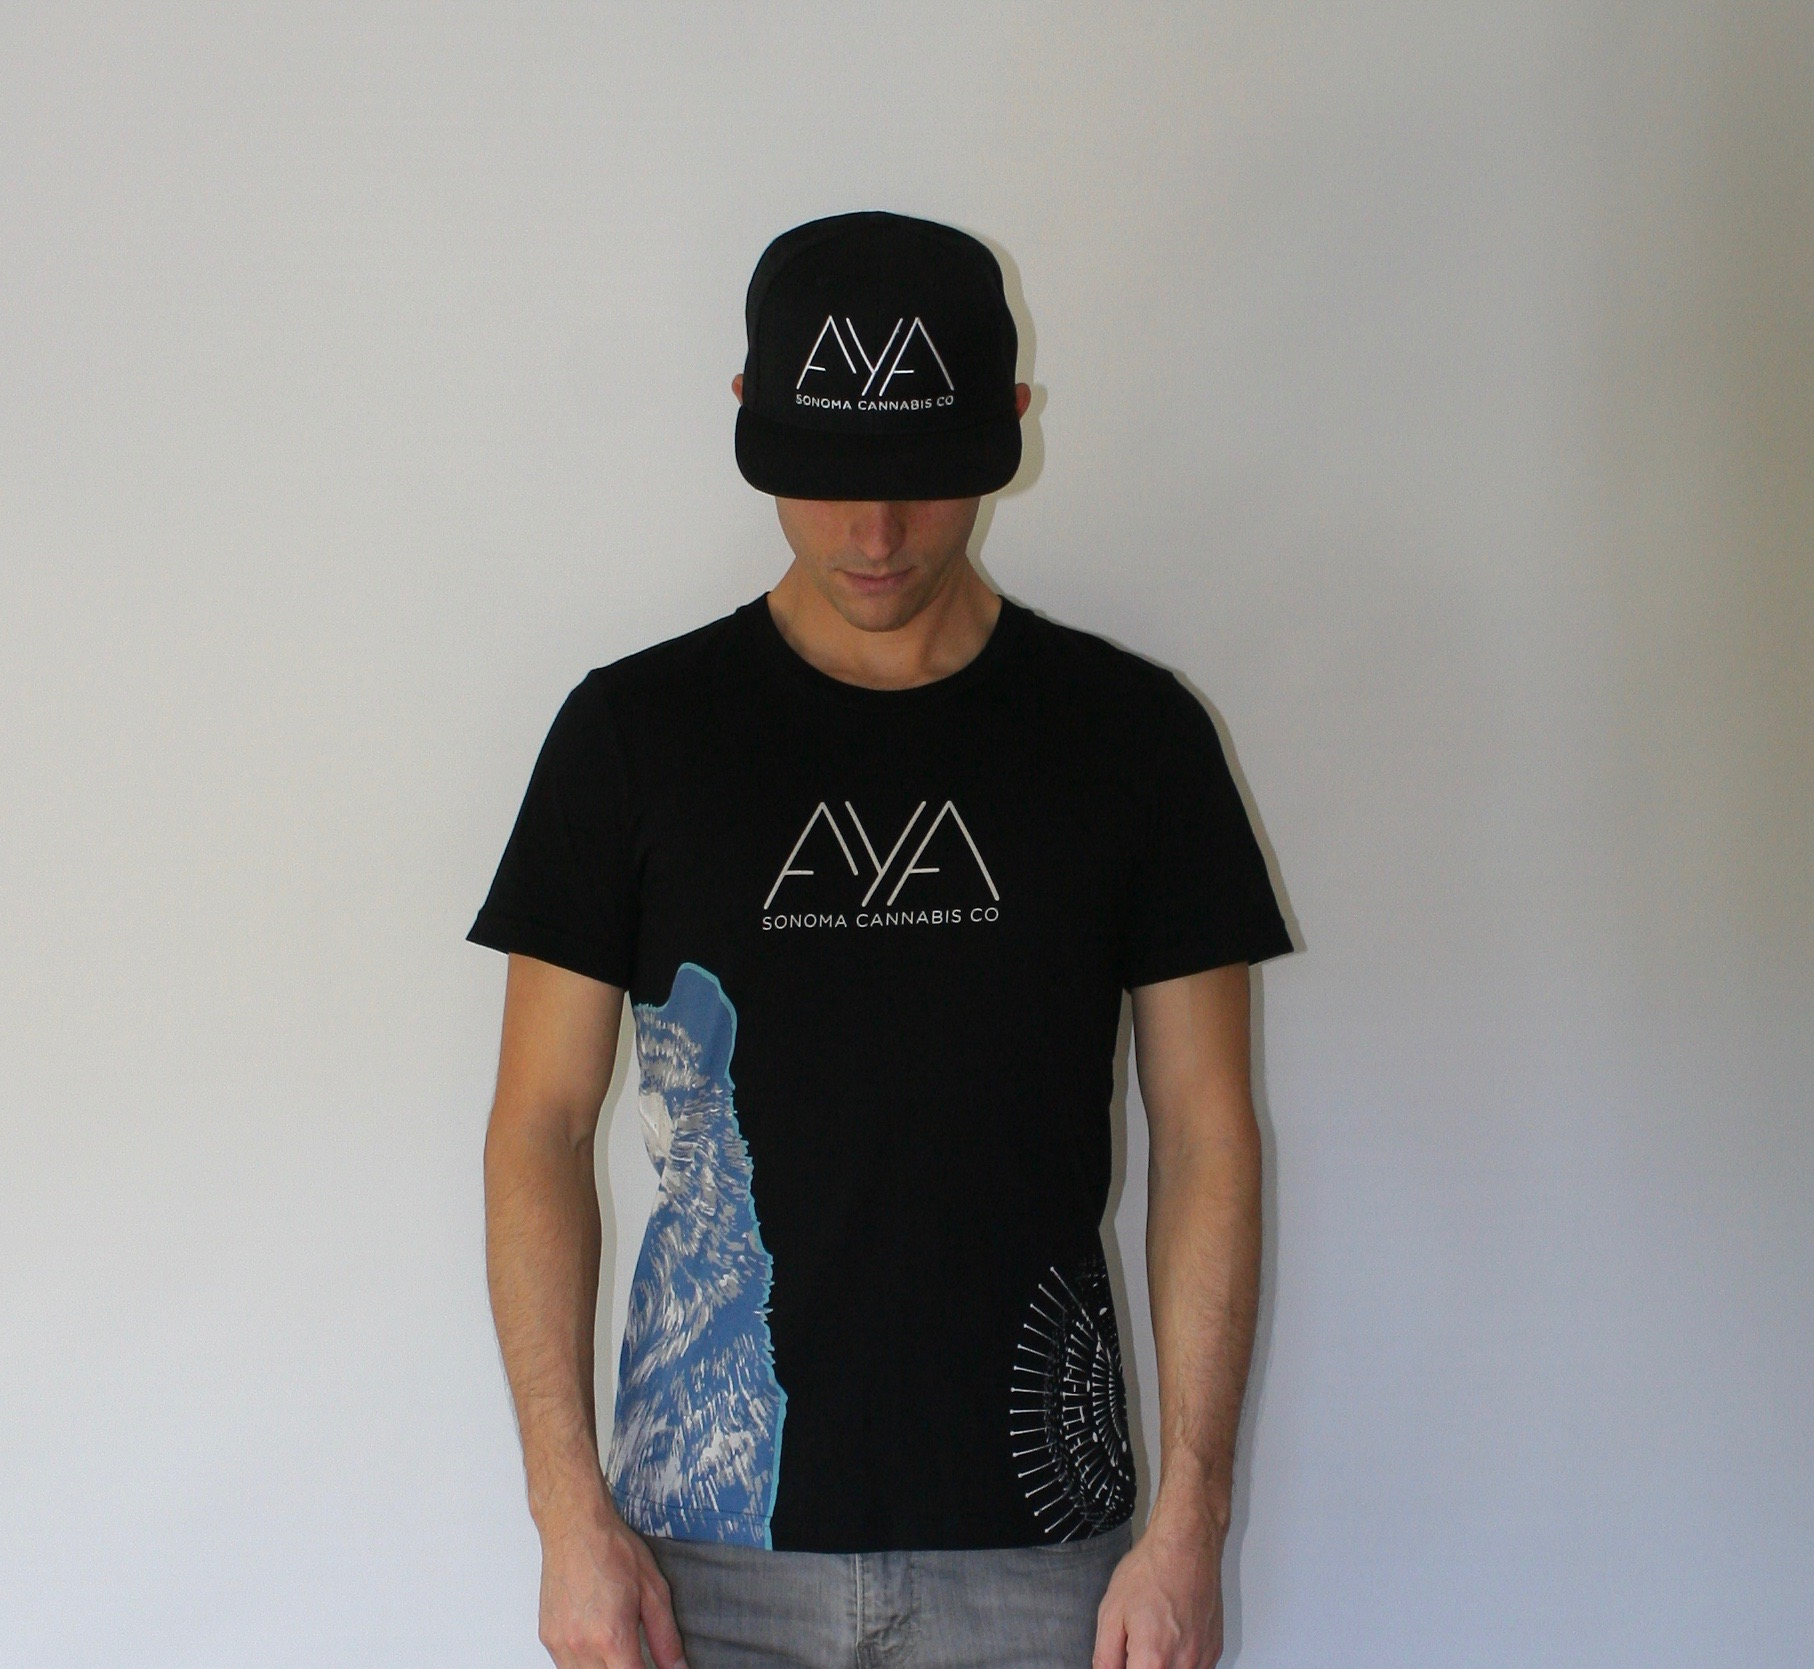 805d6c4db Men's T-Shirt — AYA by Sonoma Cannabis Company